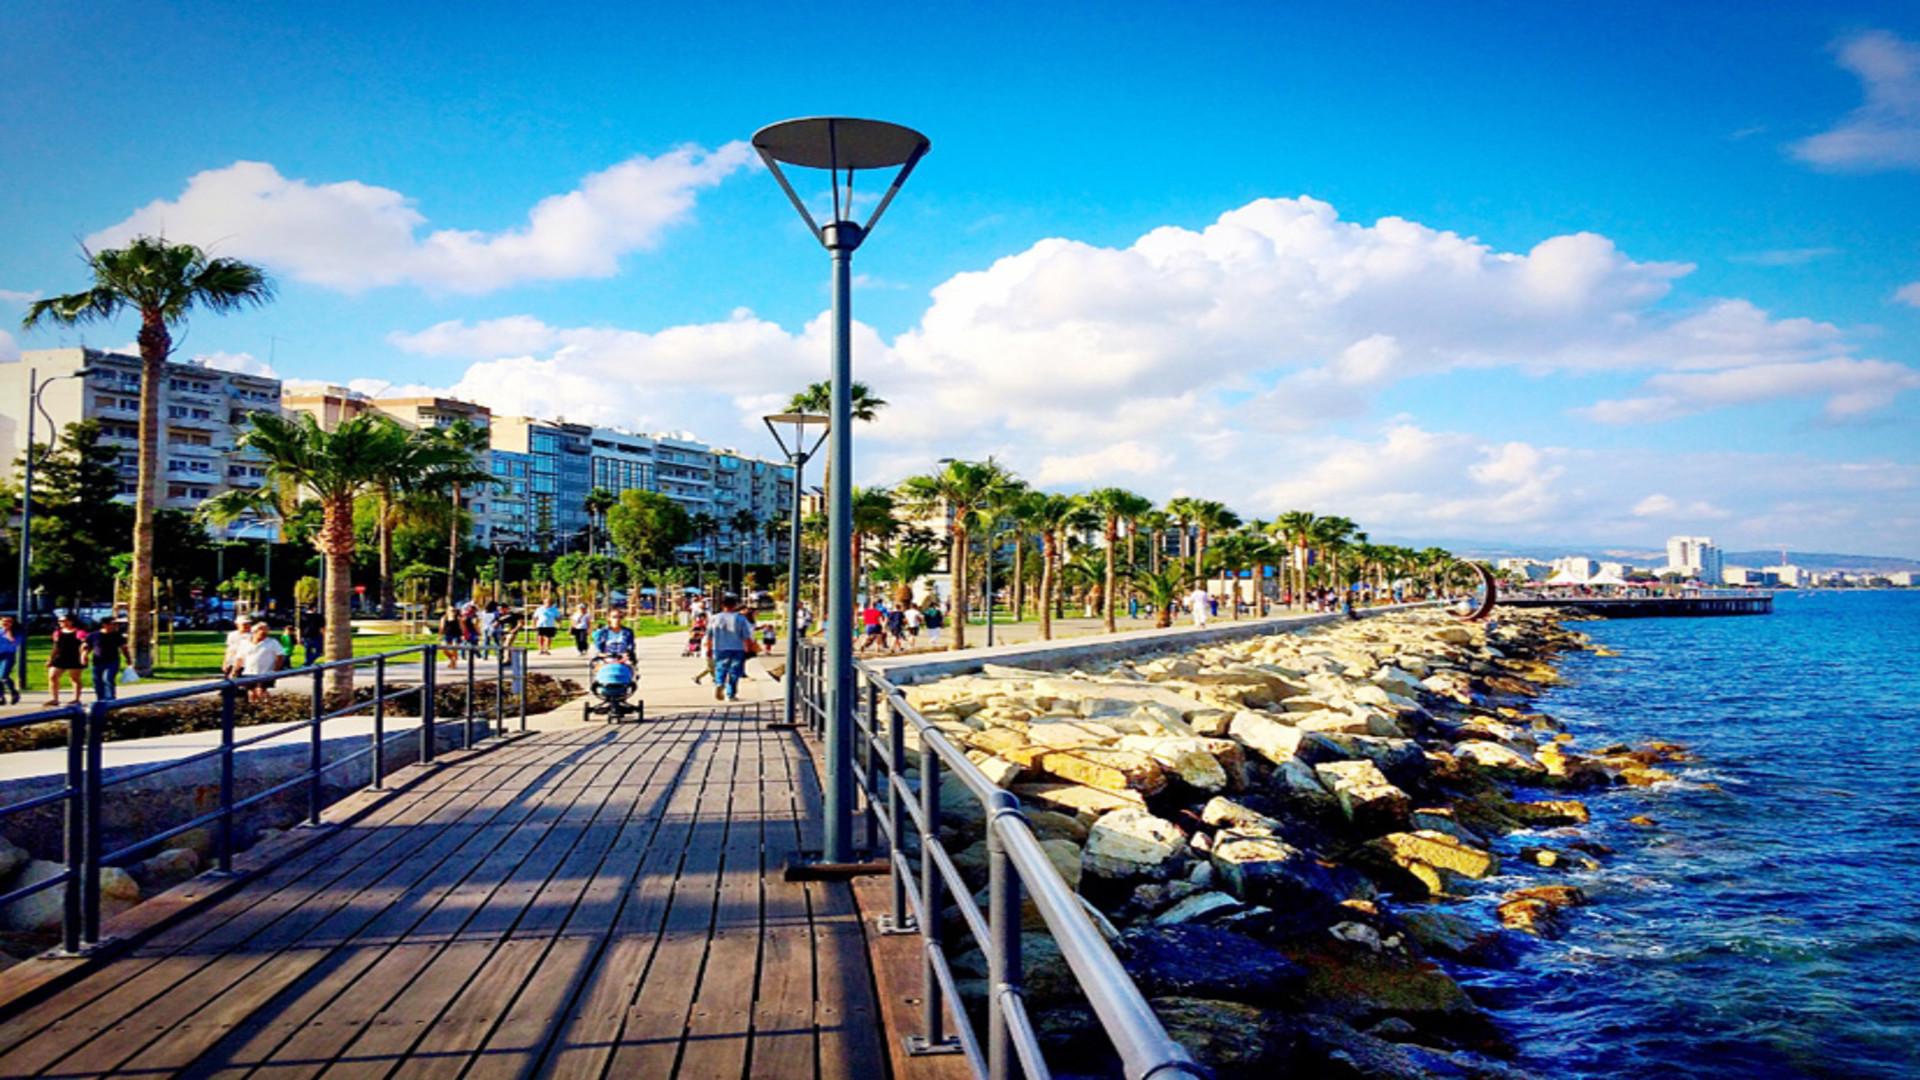 Boulevard Limassol, Cyprus